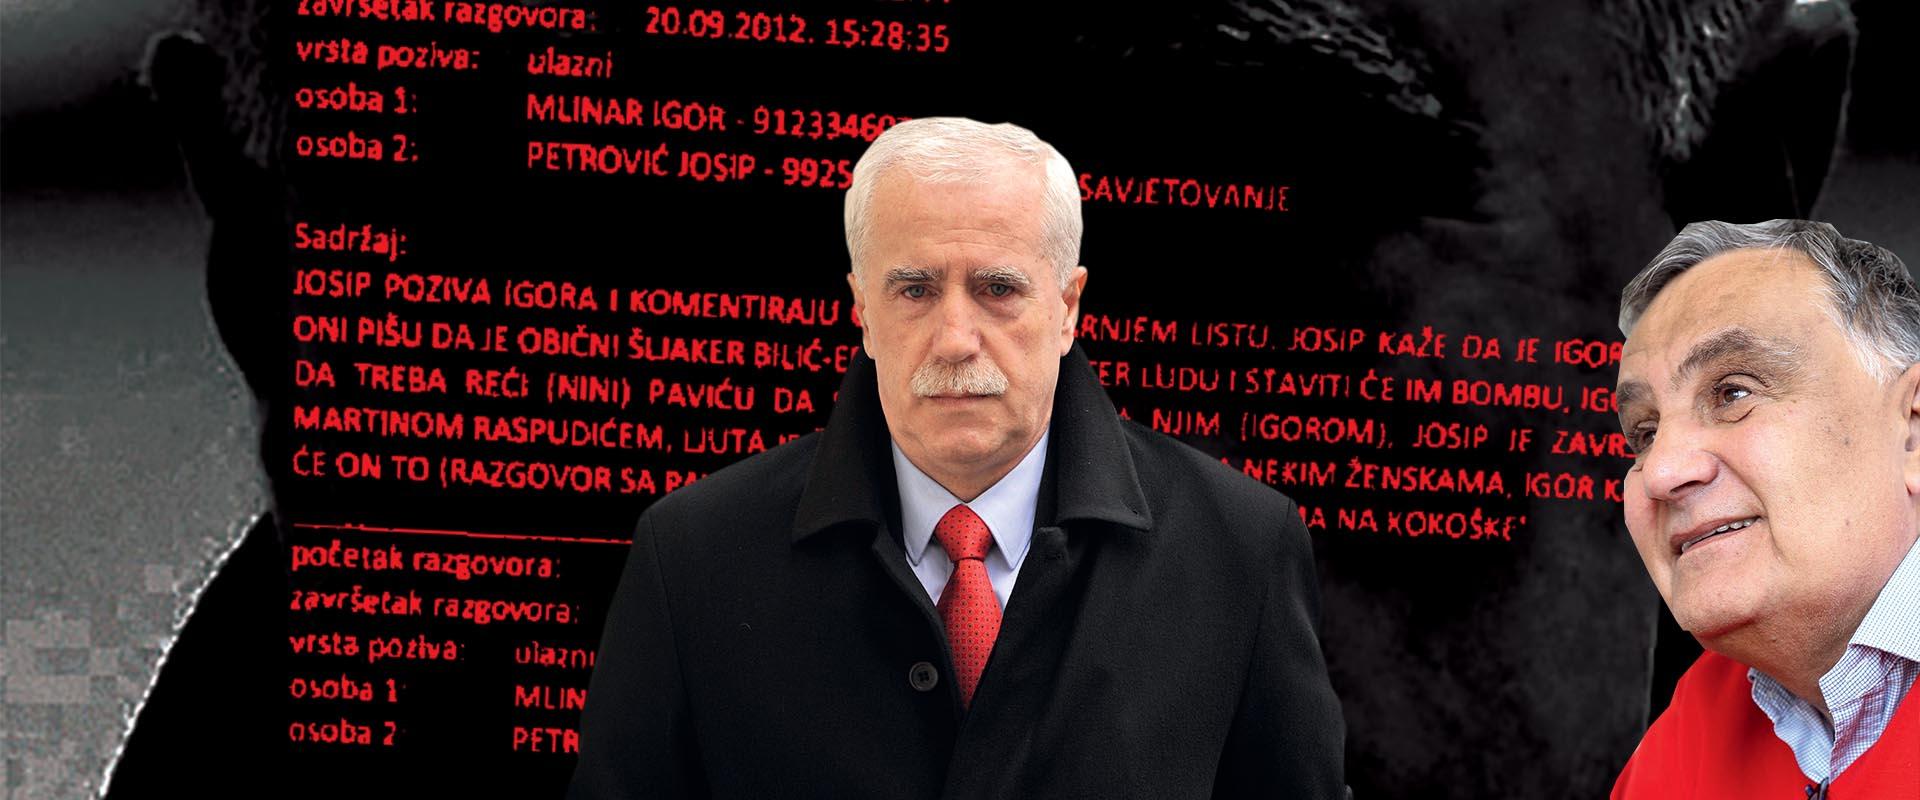 EKSKLUZIVNO: Policijski transkripti tajno snimanih telefonskih razgovora Josipa Petrovića